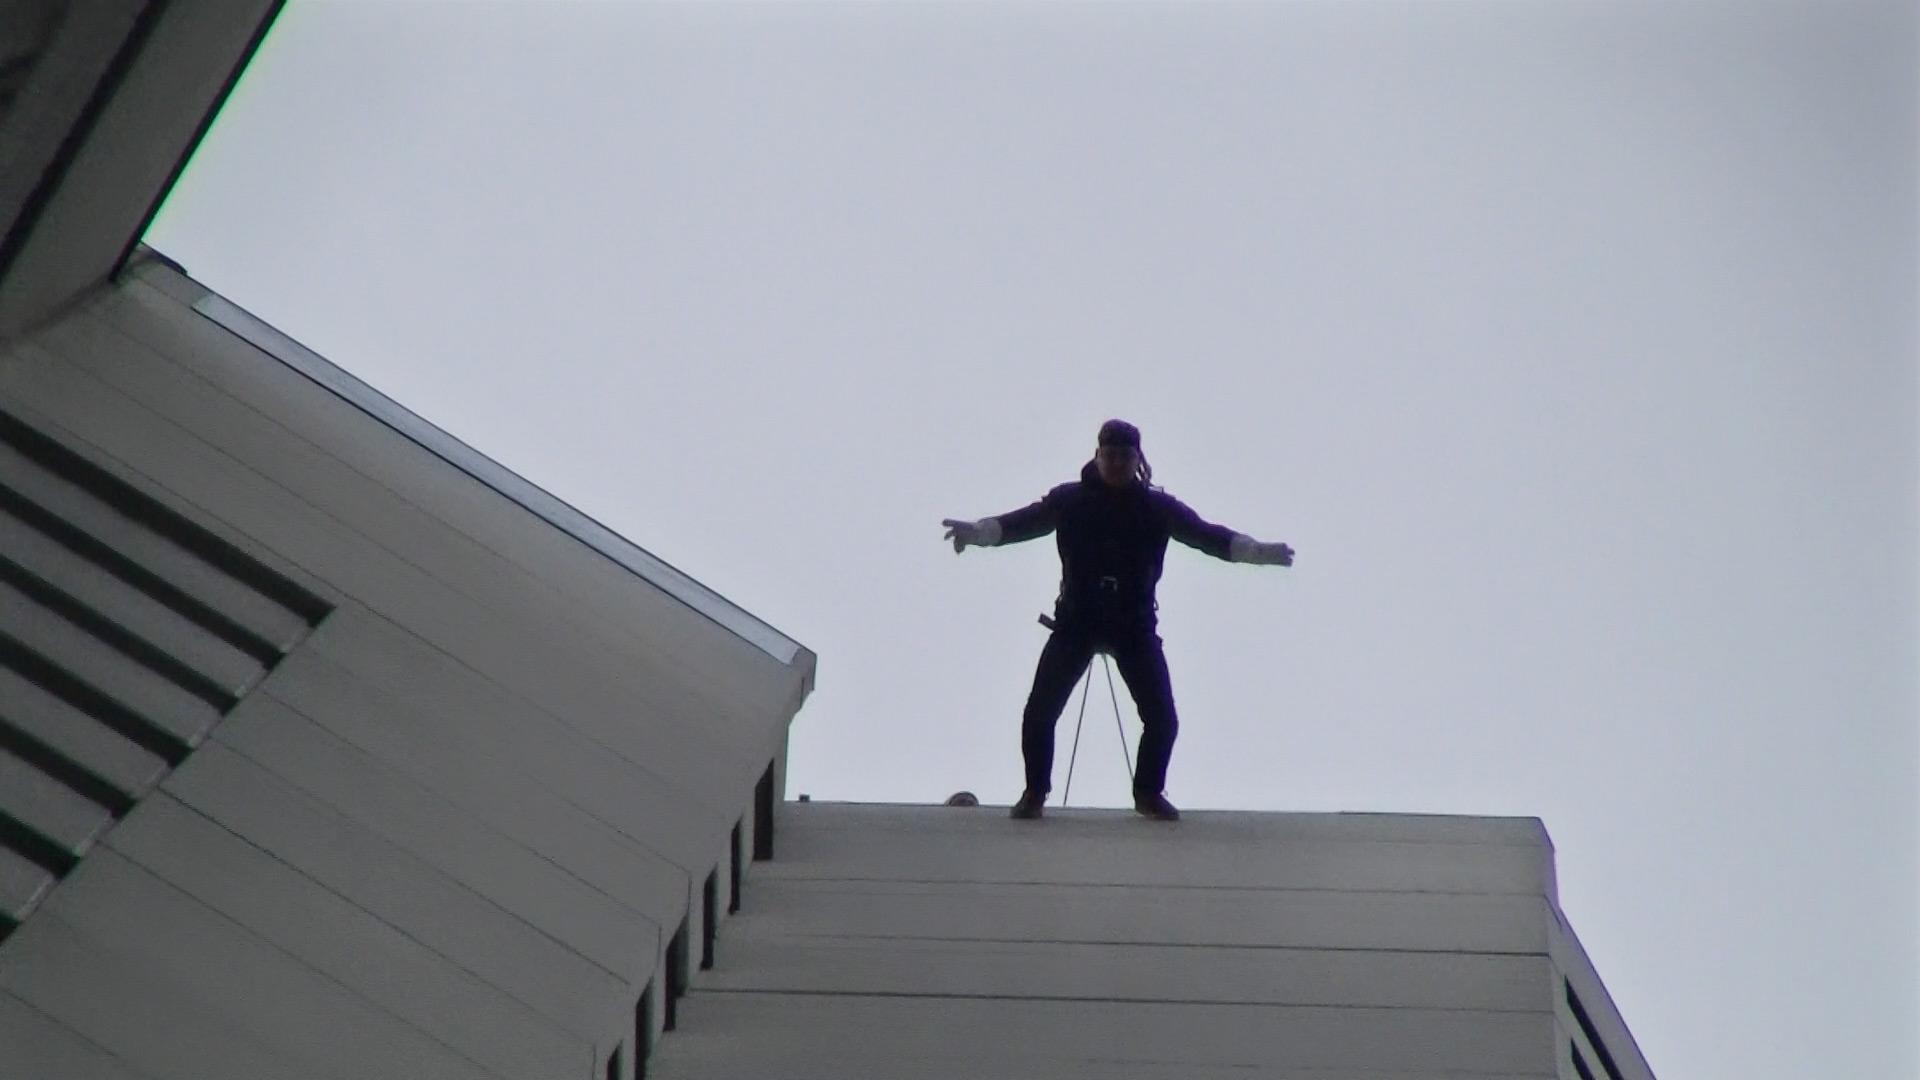 Sky Running Jochen Schweizer - Frankfurt am Main - Houserunning Hochhaus - House Running am Wolkenkratzer